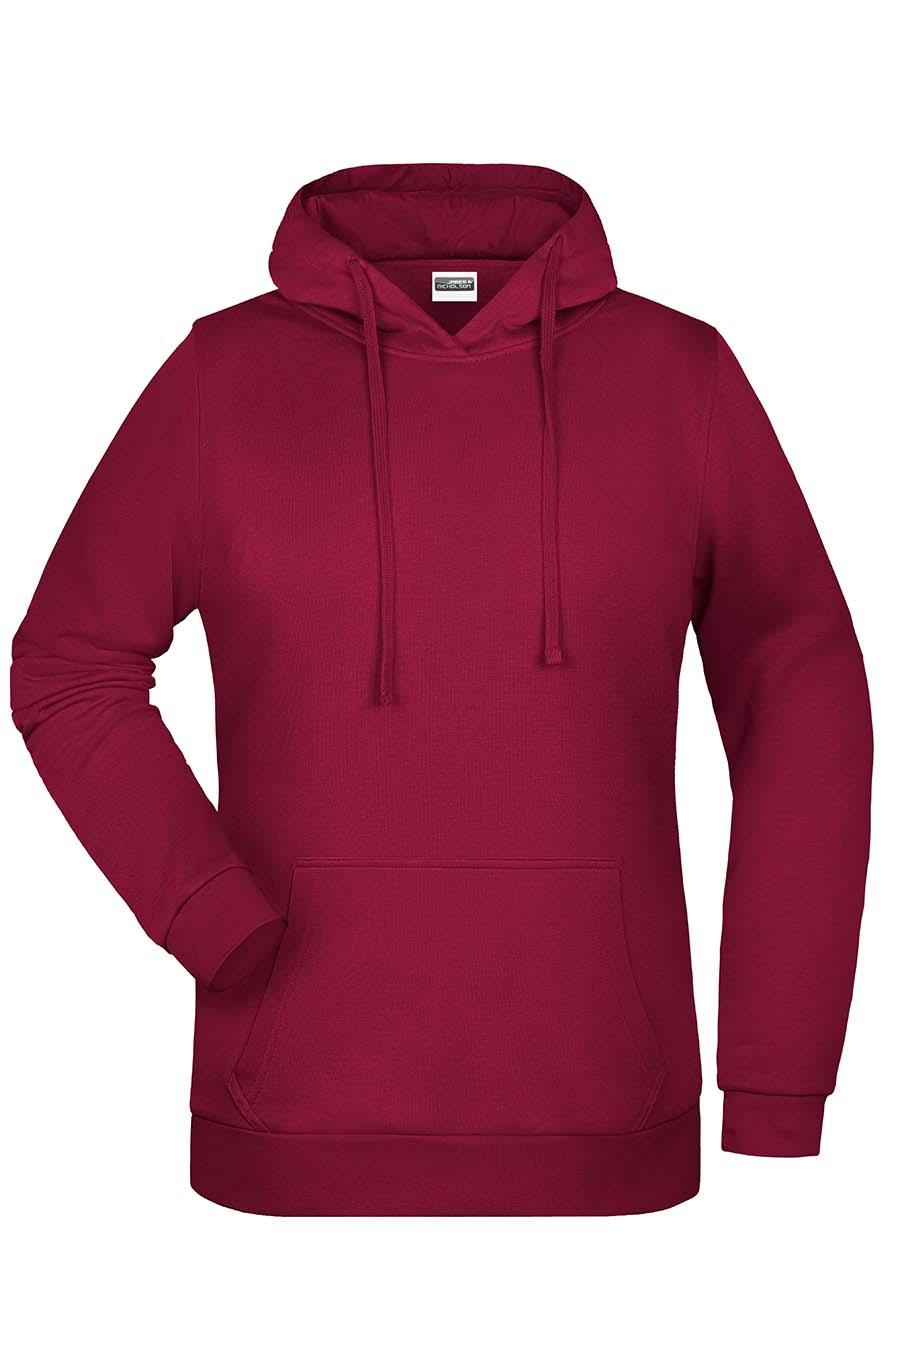 Sweat-shirt capuche femme - 20-1494-22